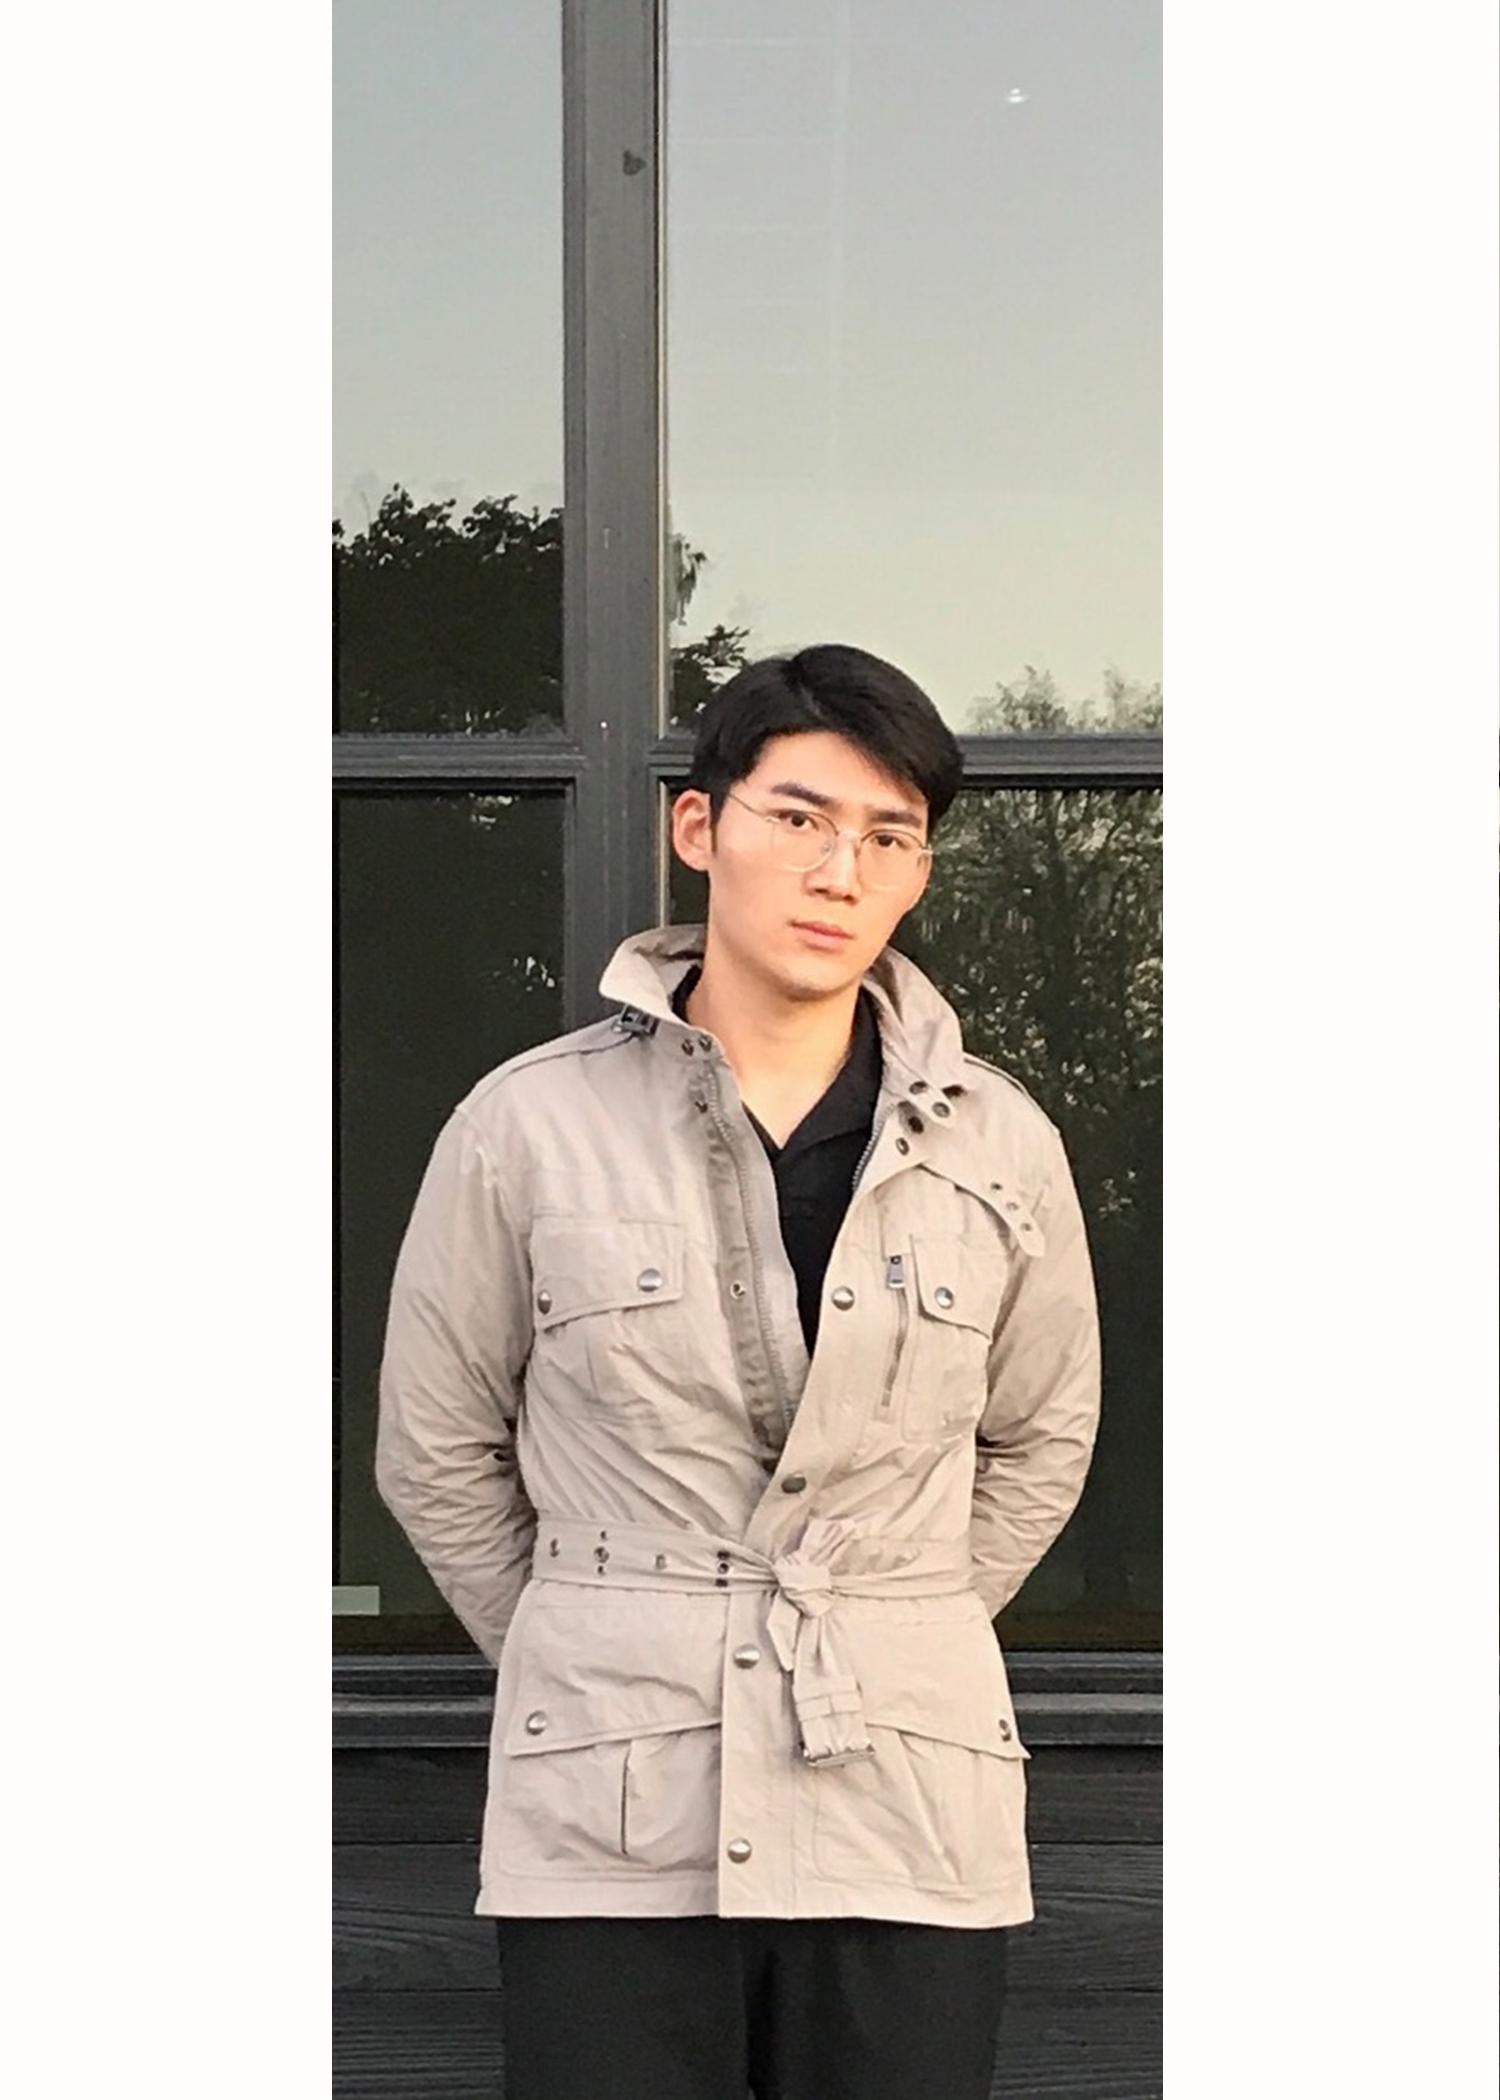 Hangael (Han) Park - Undergraduate student in Apparel, Merchandising and Design.Han is the recipient of the Louise Rosenfeld Undergraduate Research Internship.